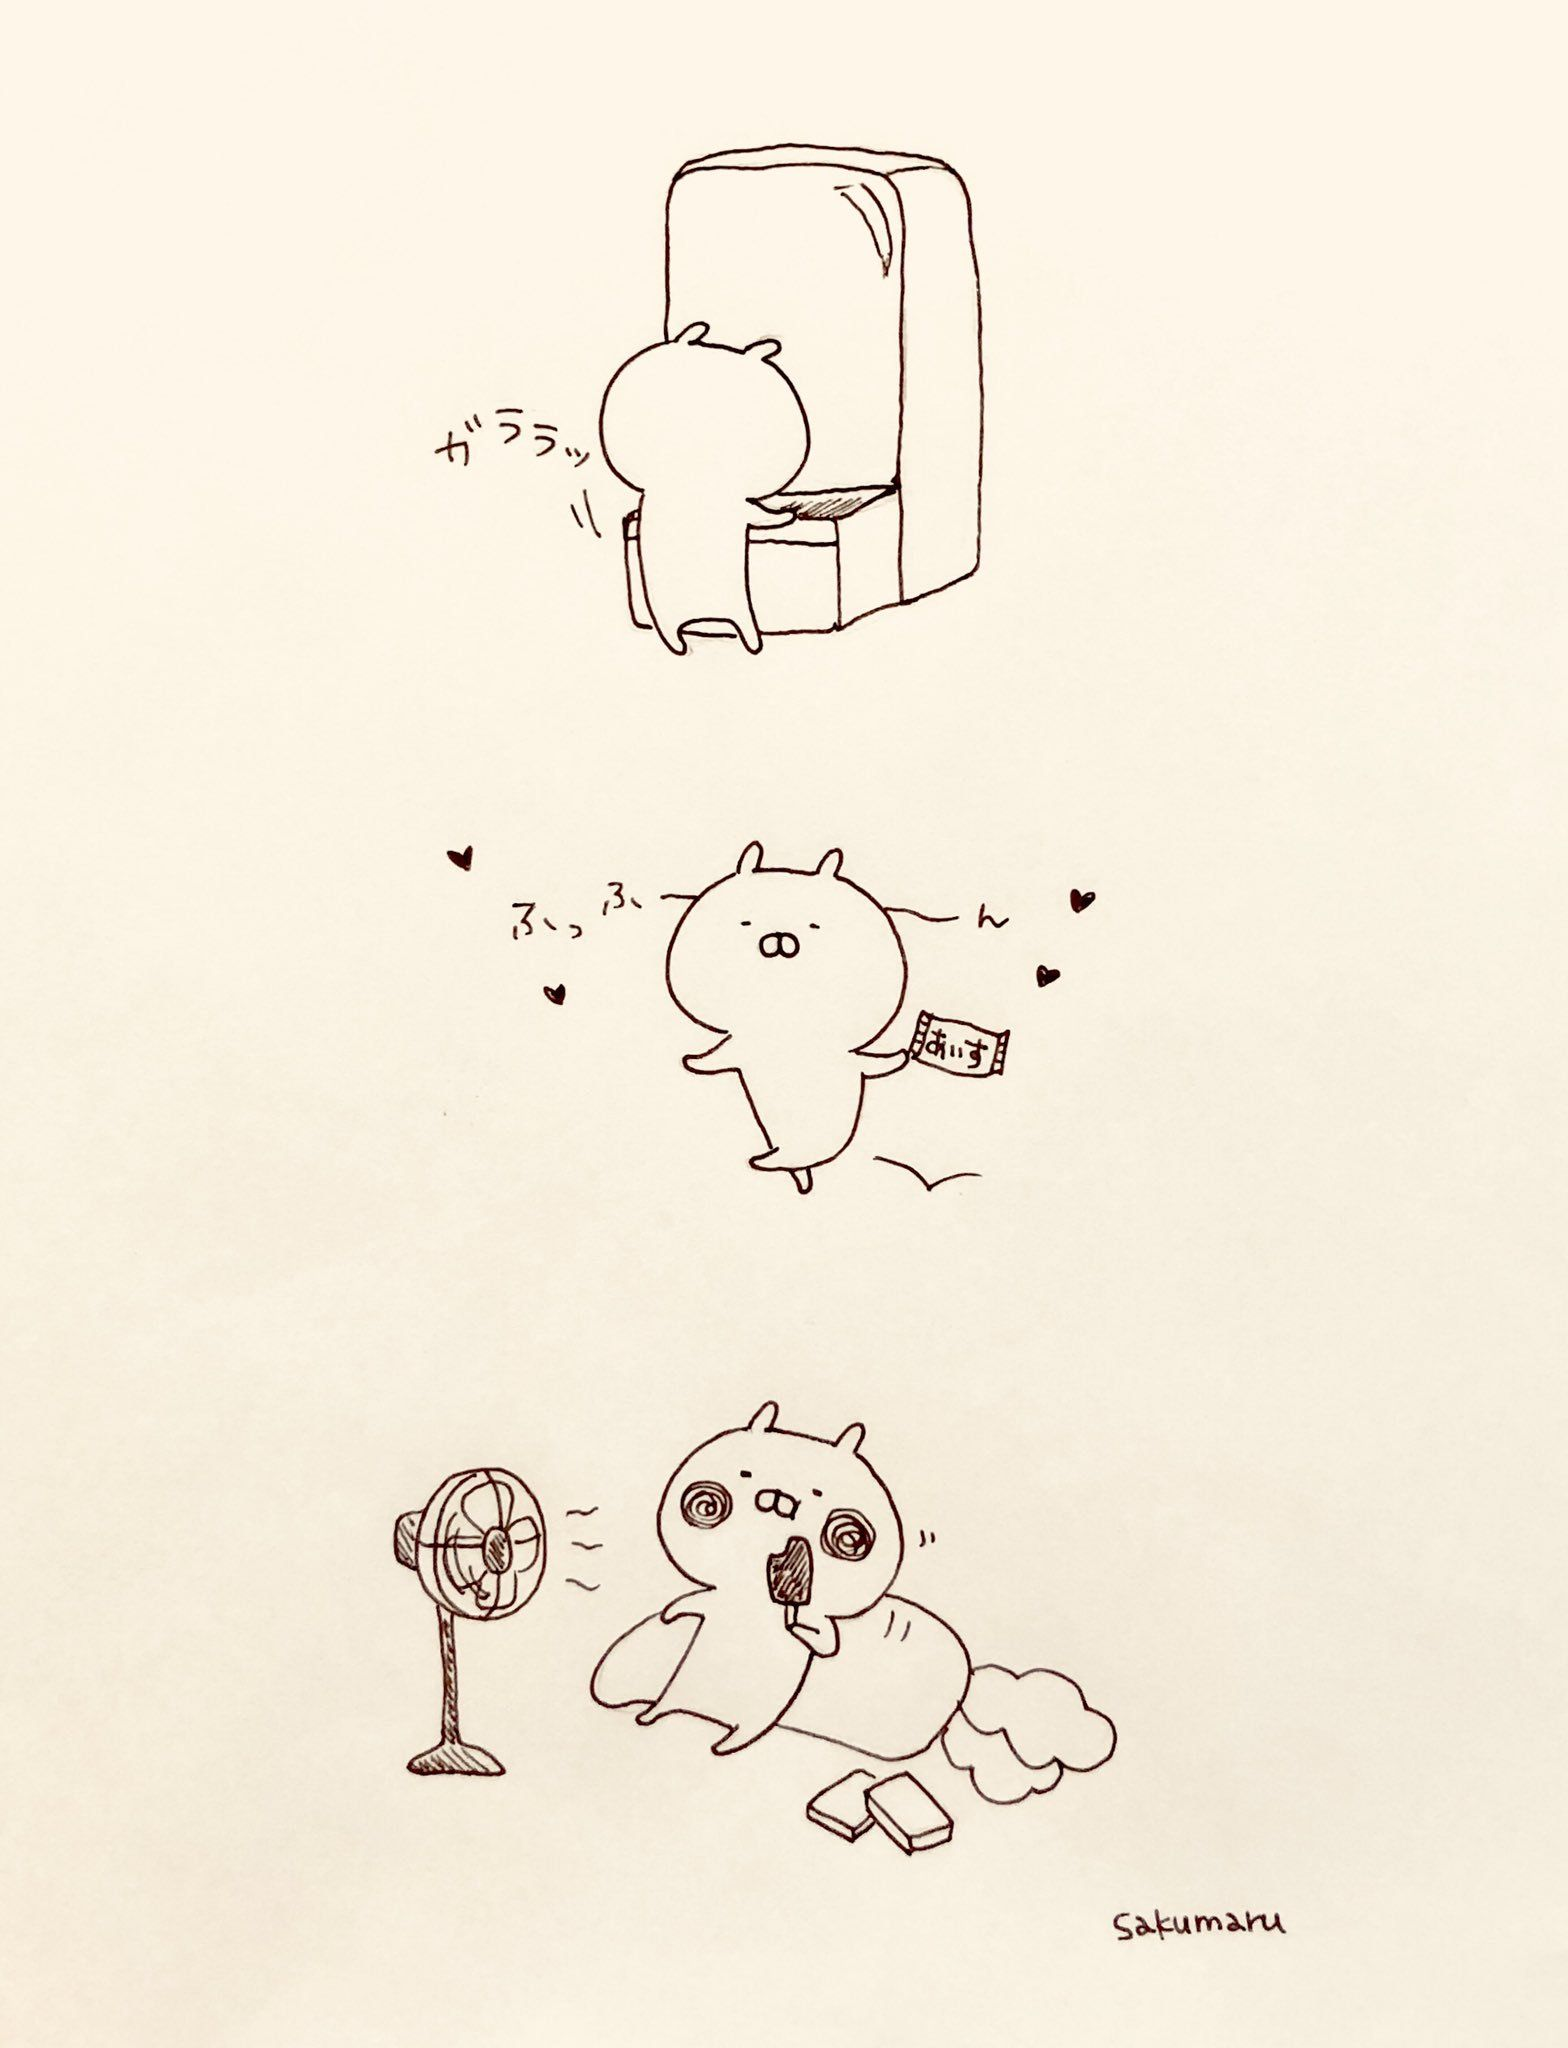 Sakumaru うさまるといっしょ Kawaii Doodles Illustration